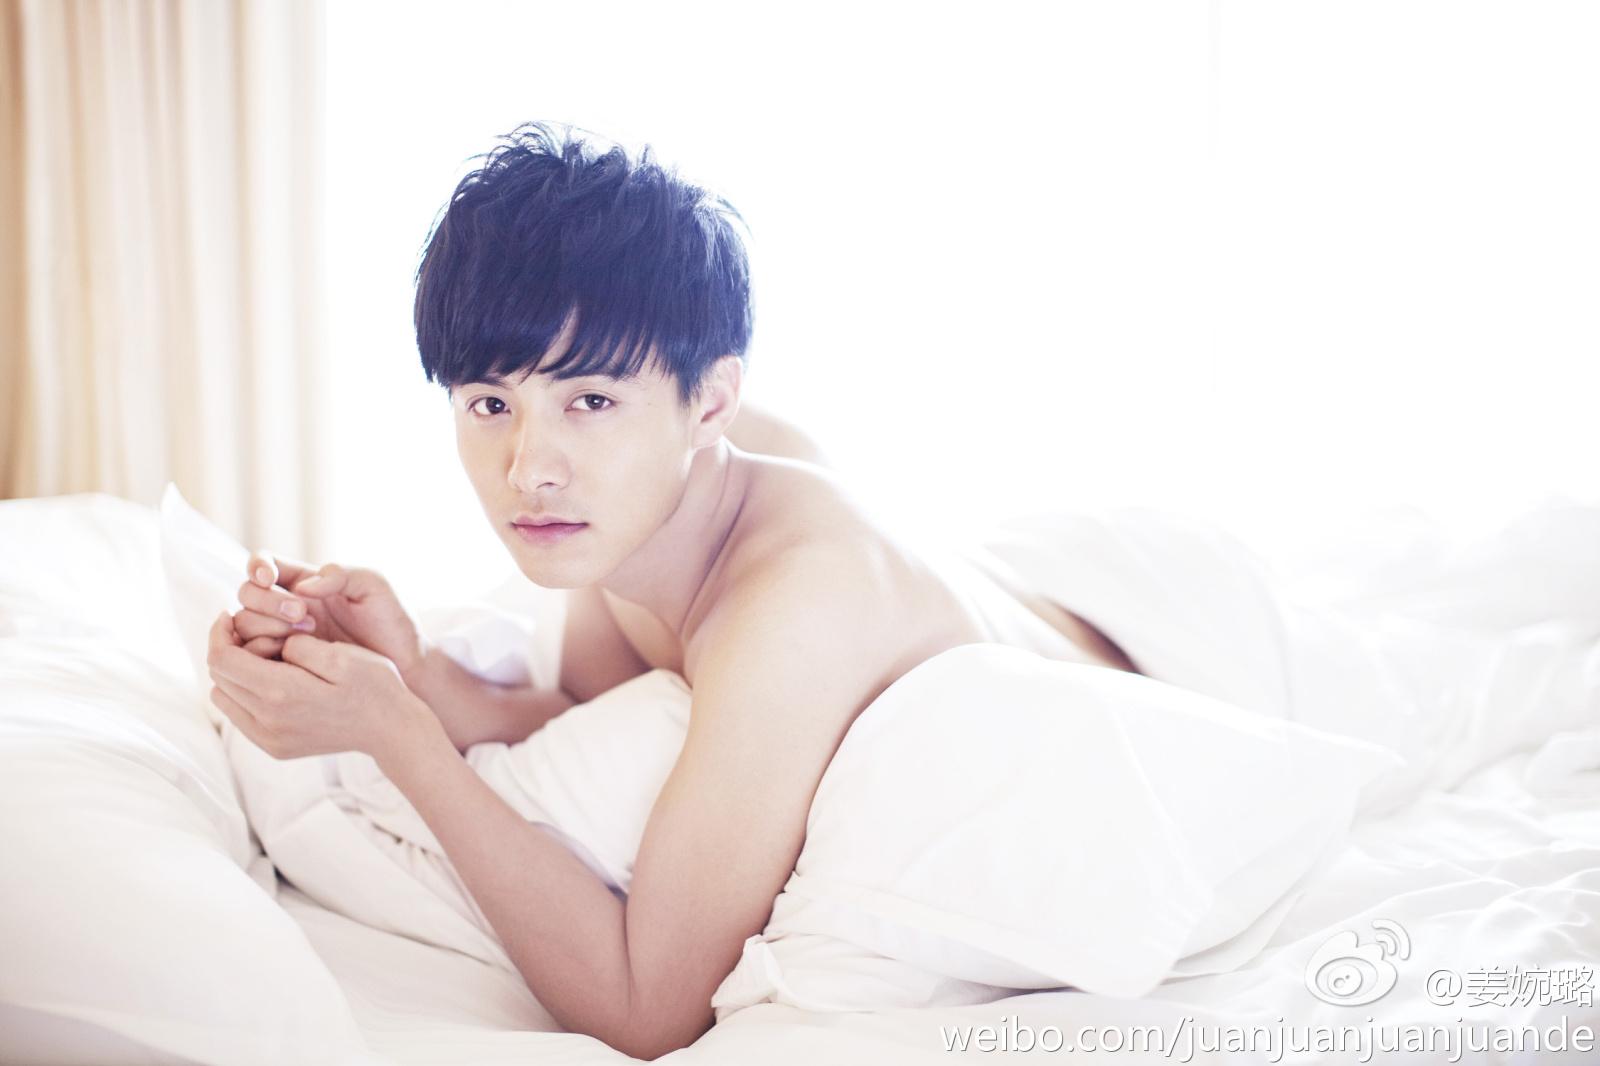 Рэй Ма (Ма Тянь Юй) / Ray Ma (Ma Tian Yu) (Китай, актер) 8a71b52a6220b80c35a9c72405d991fa